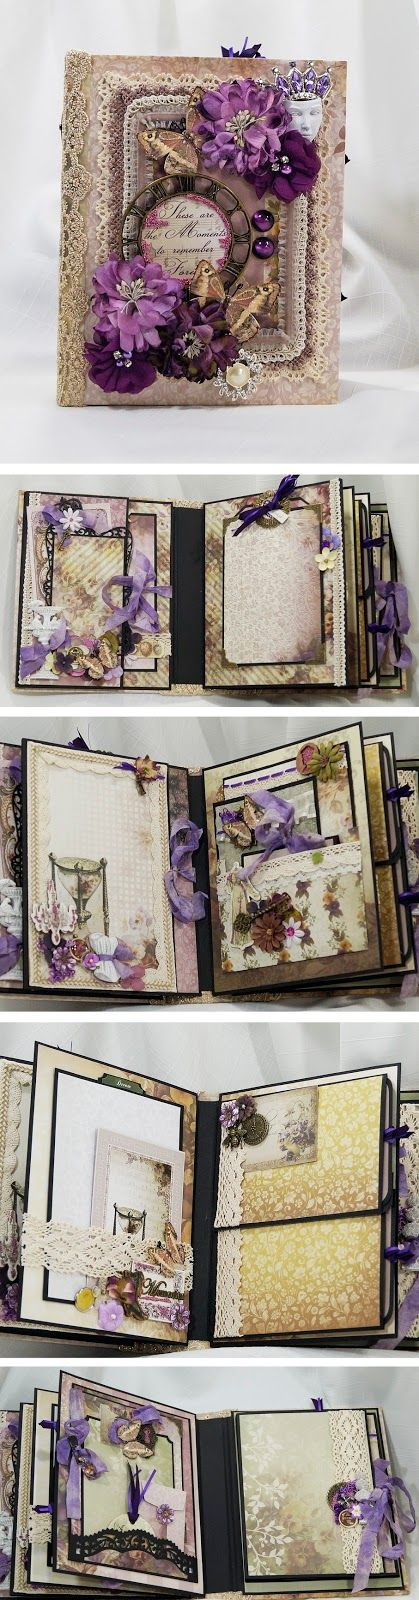 Terry's Scrapbooks: Couture Creations - Hearts Ease Mini Album